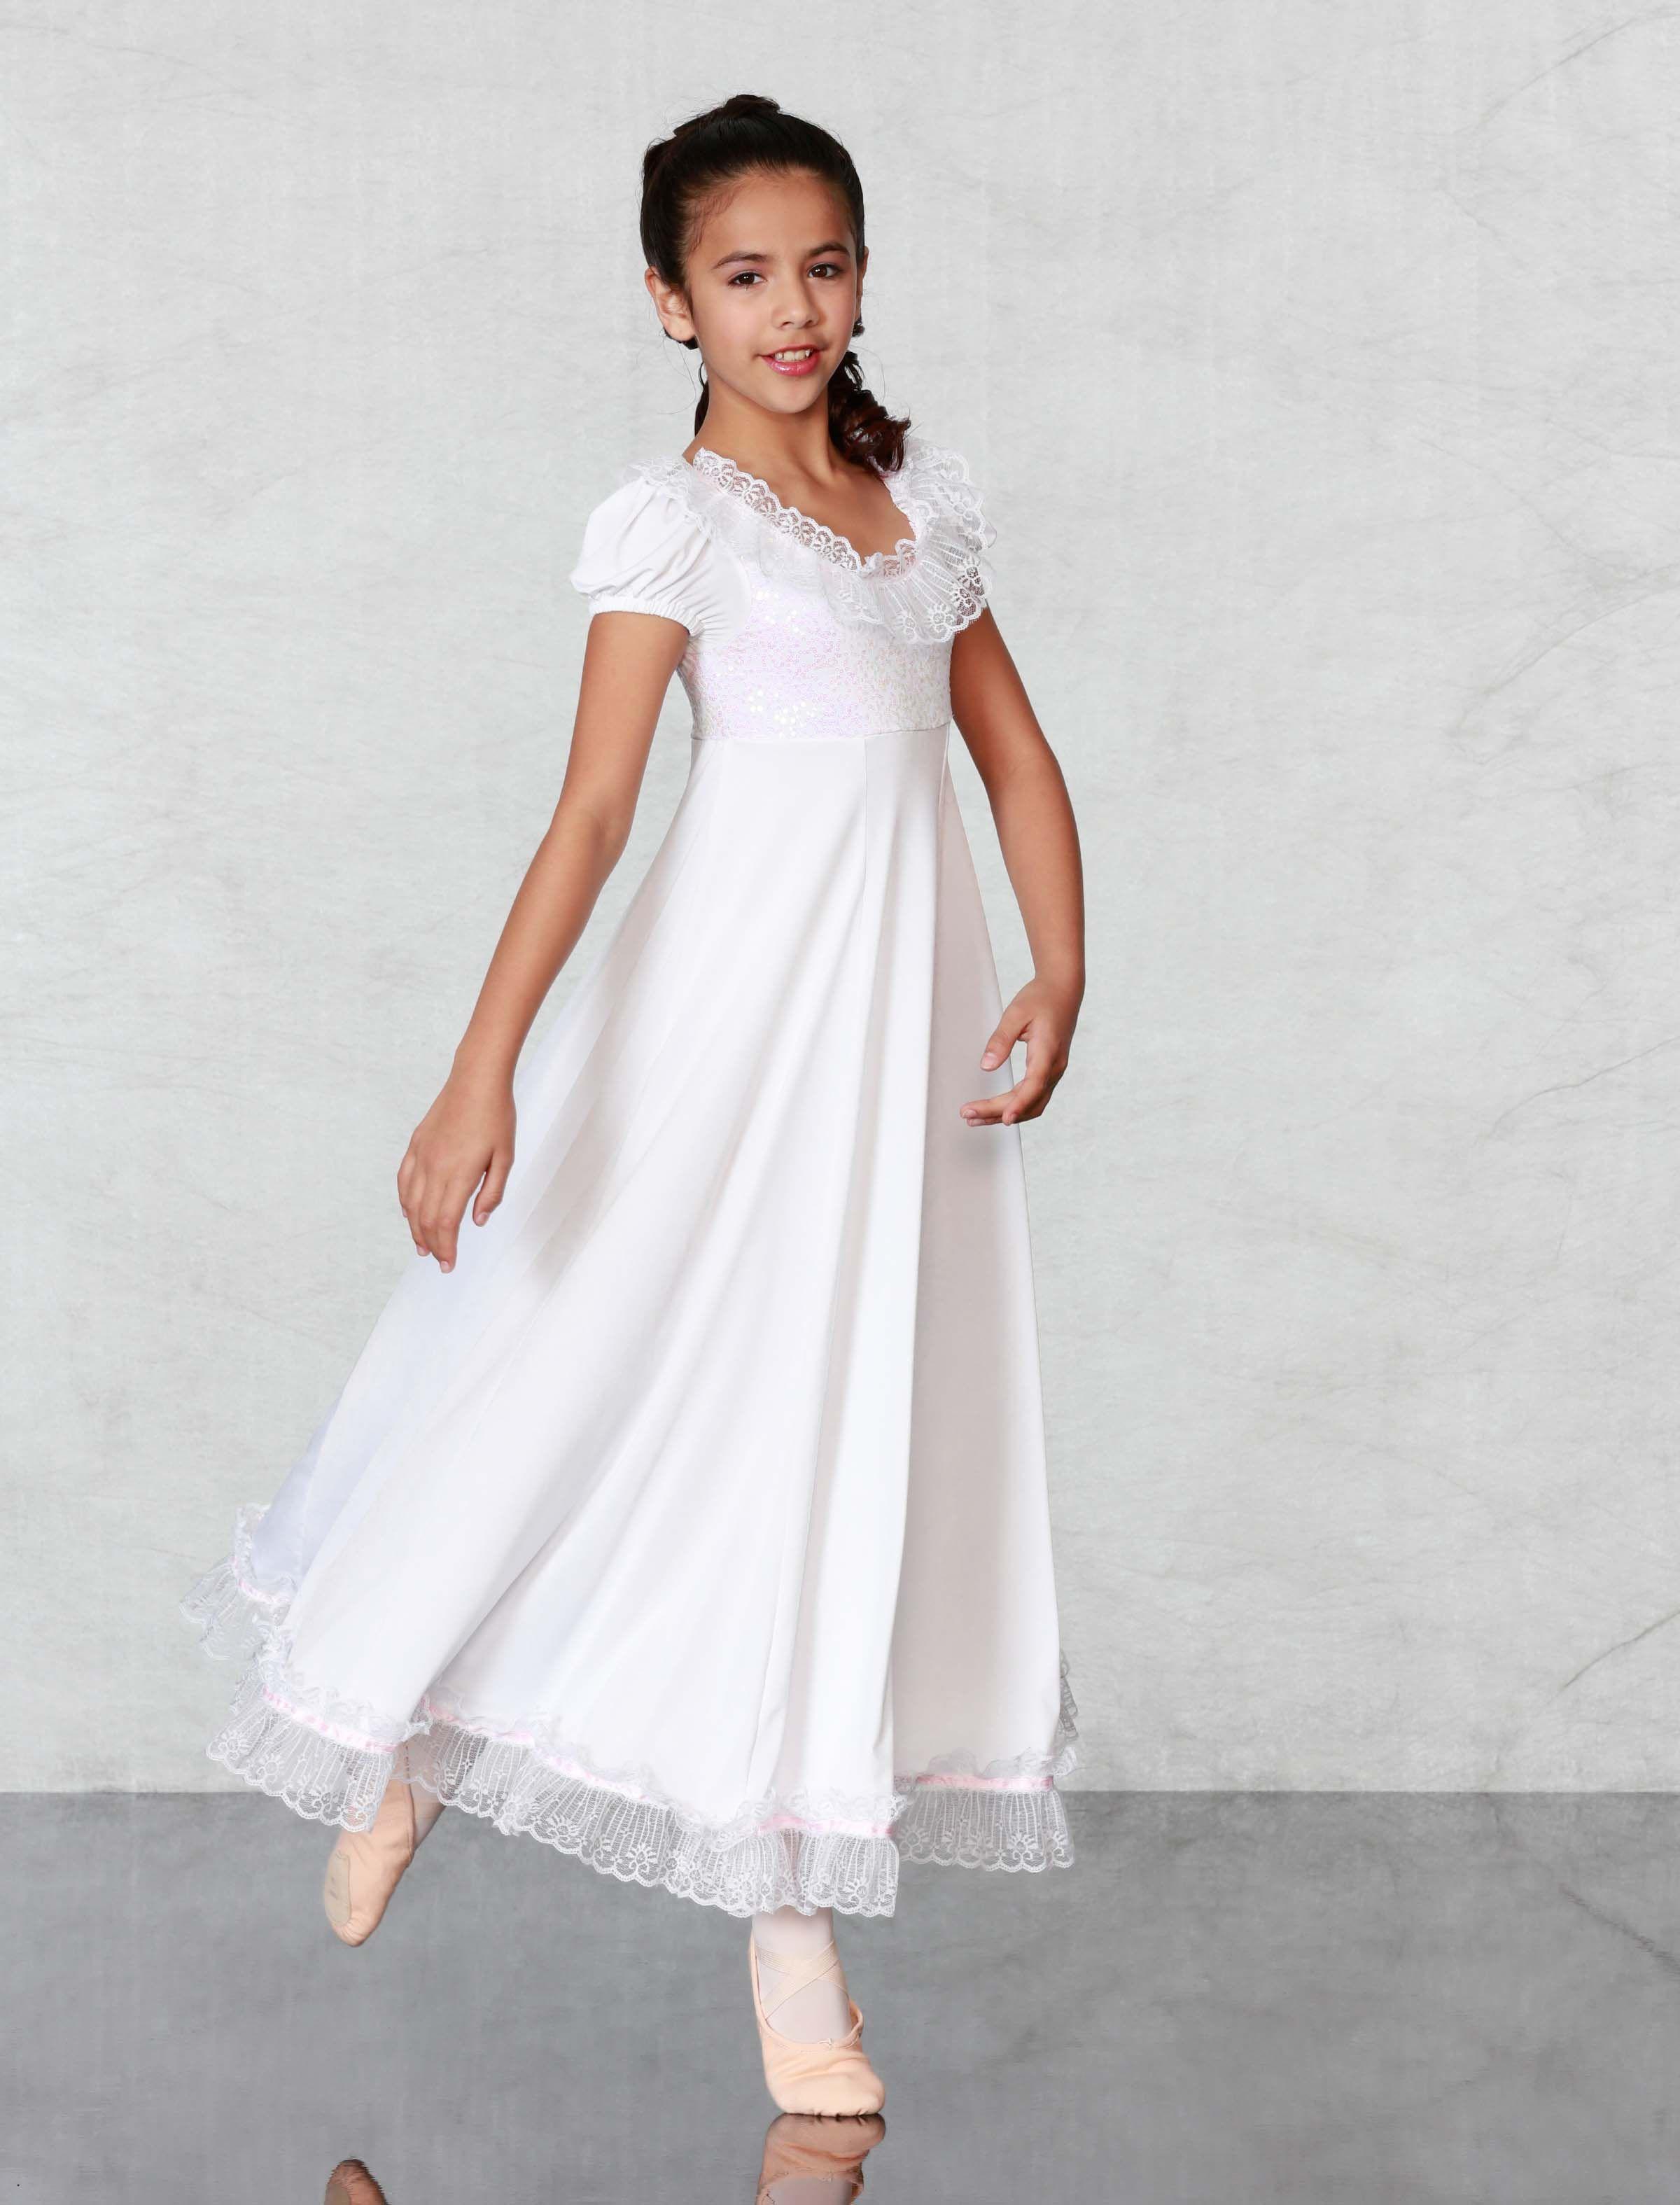 NUTCRACKER CLARA NIGHTGOWN. NUTCRACKER CLARA NIGHTGOWN Nutcracker Ballet  Costumes ... 21bc4b46c